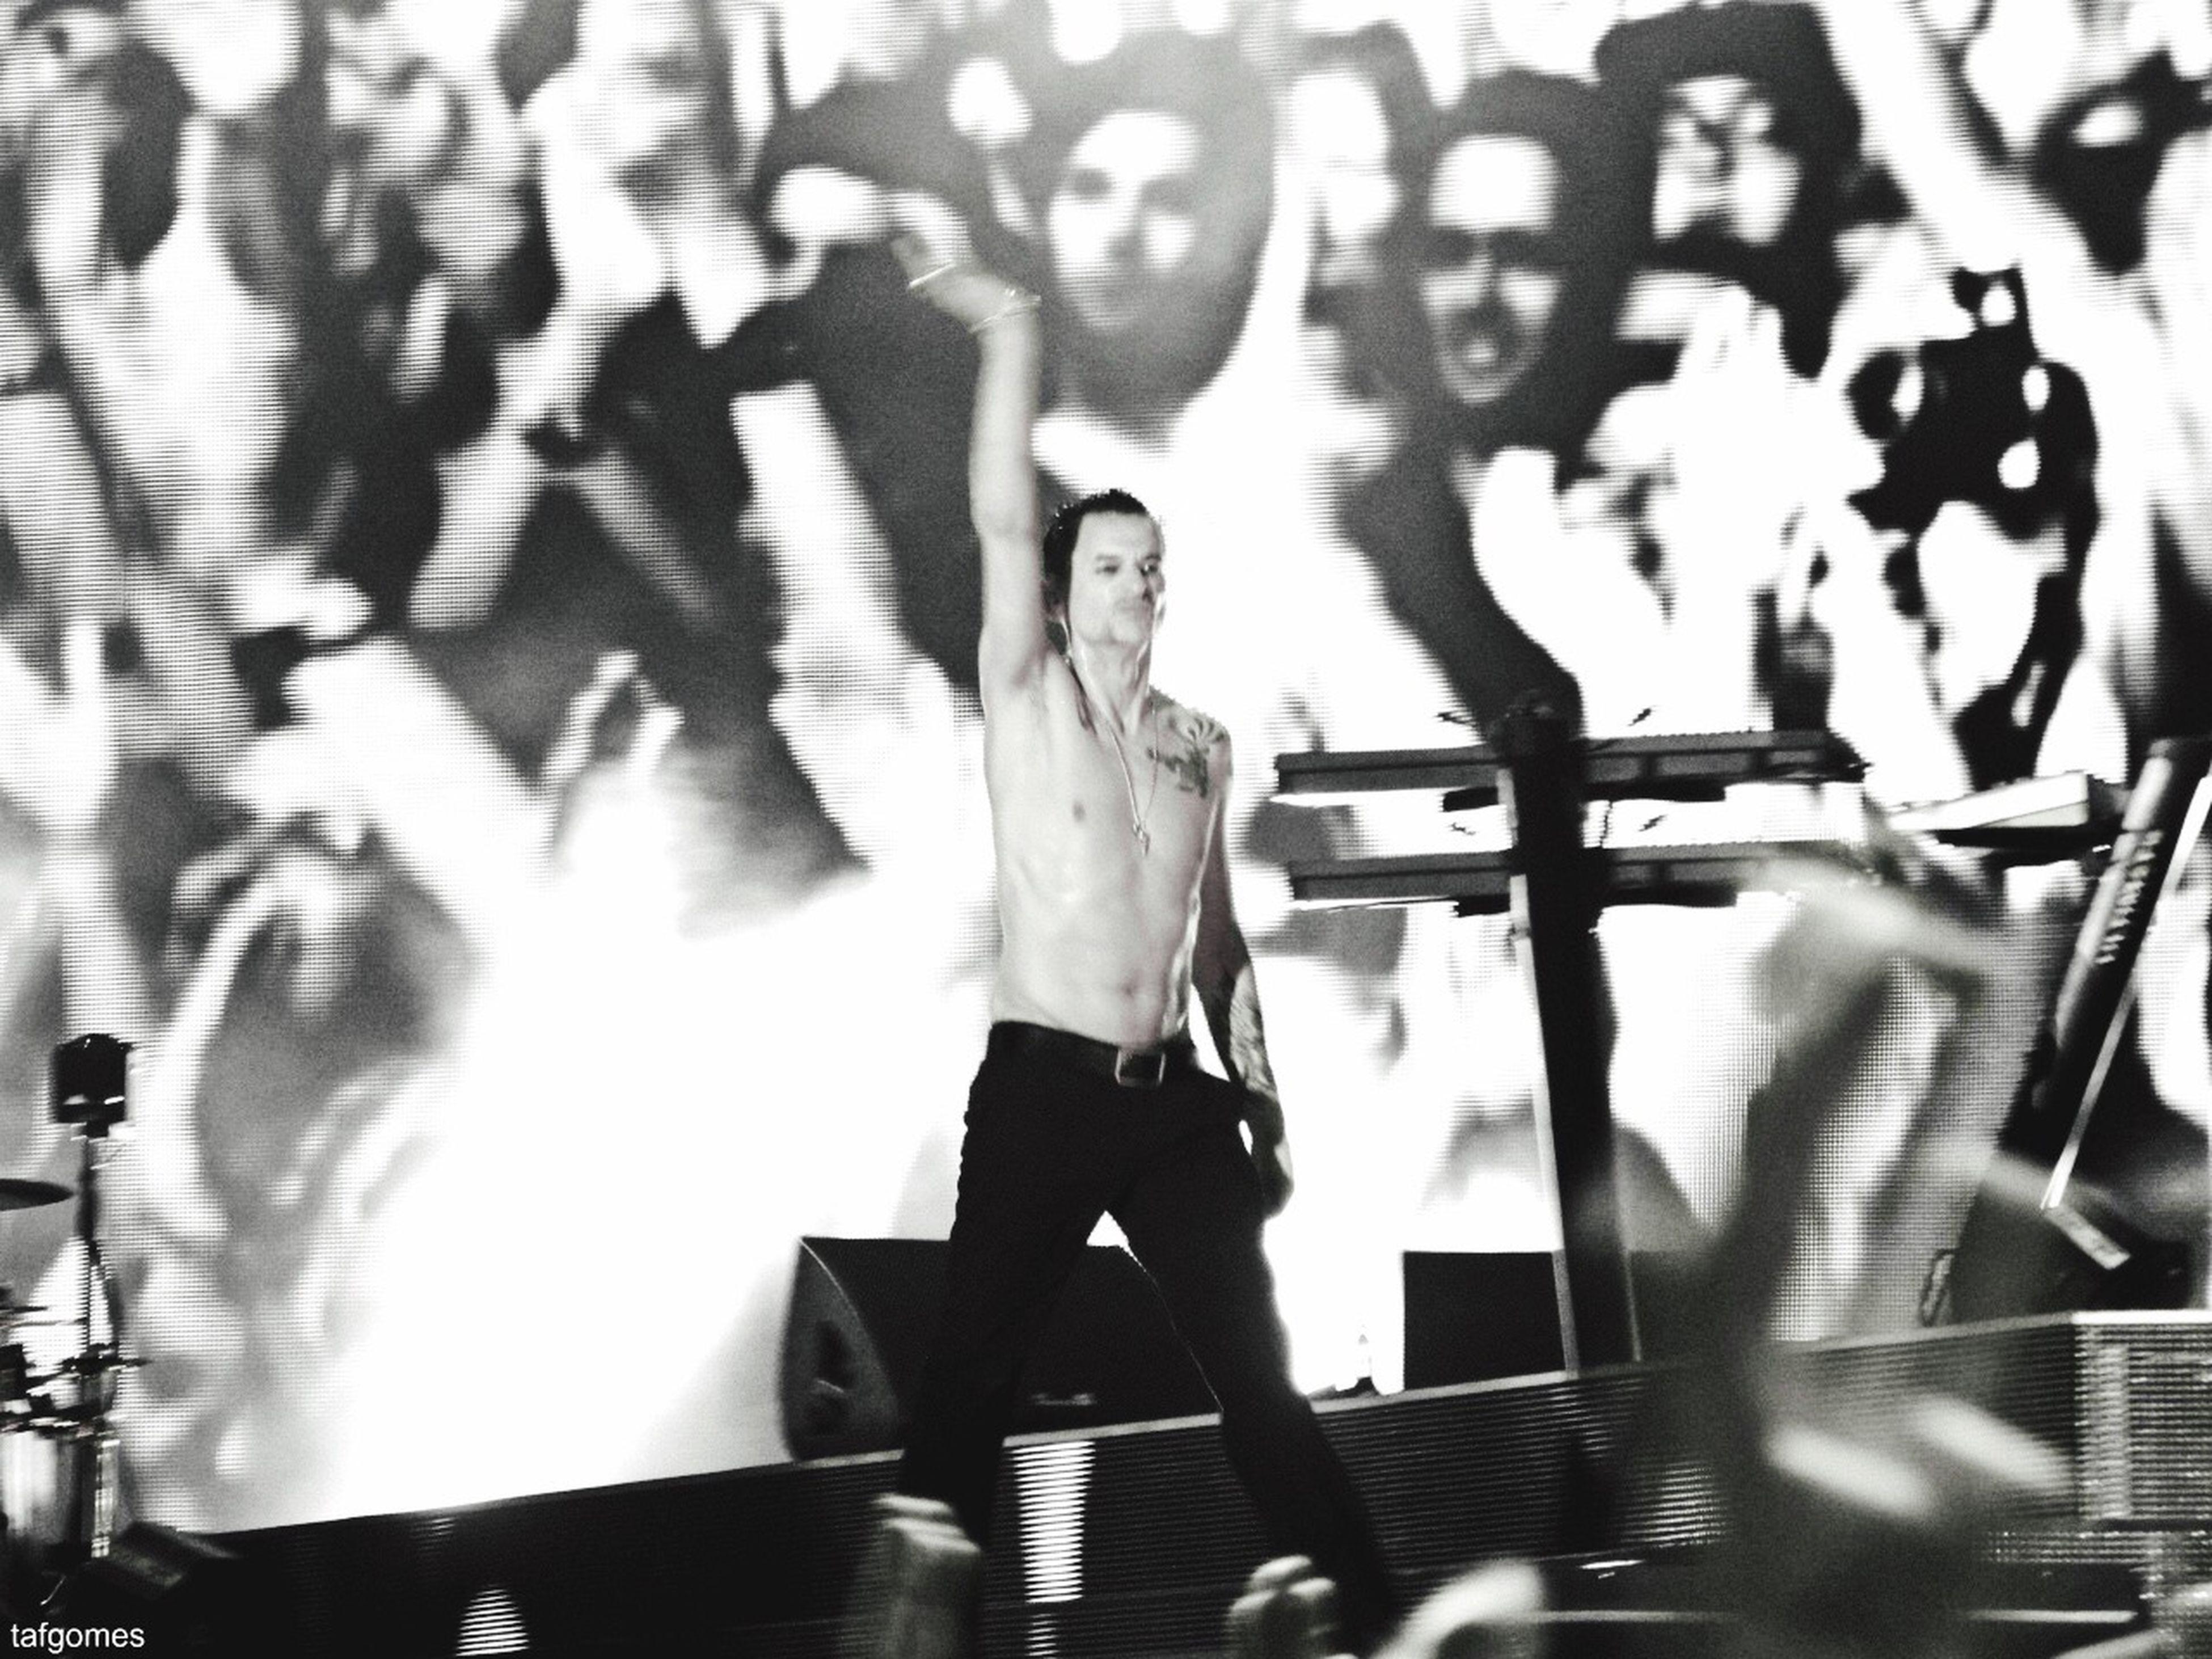 Depeche Mode Optimusalive2013 Lisboa Festival Music Music Brings Us Together Blackandwhite EyeEm Best Shots Photography Nikon Nikonphotography Nikonistas Light And Shadow Emotions David Gahan Enjoy The Silence Precious Personal Jesus Tafgomes